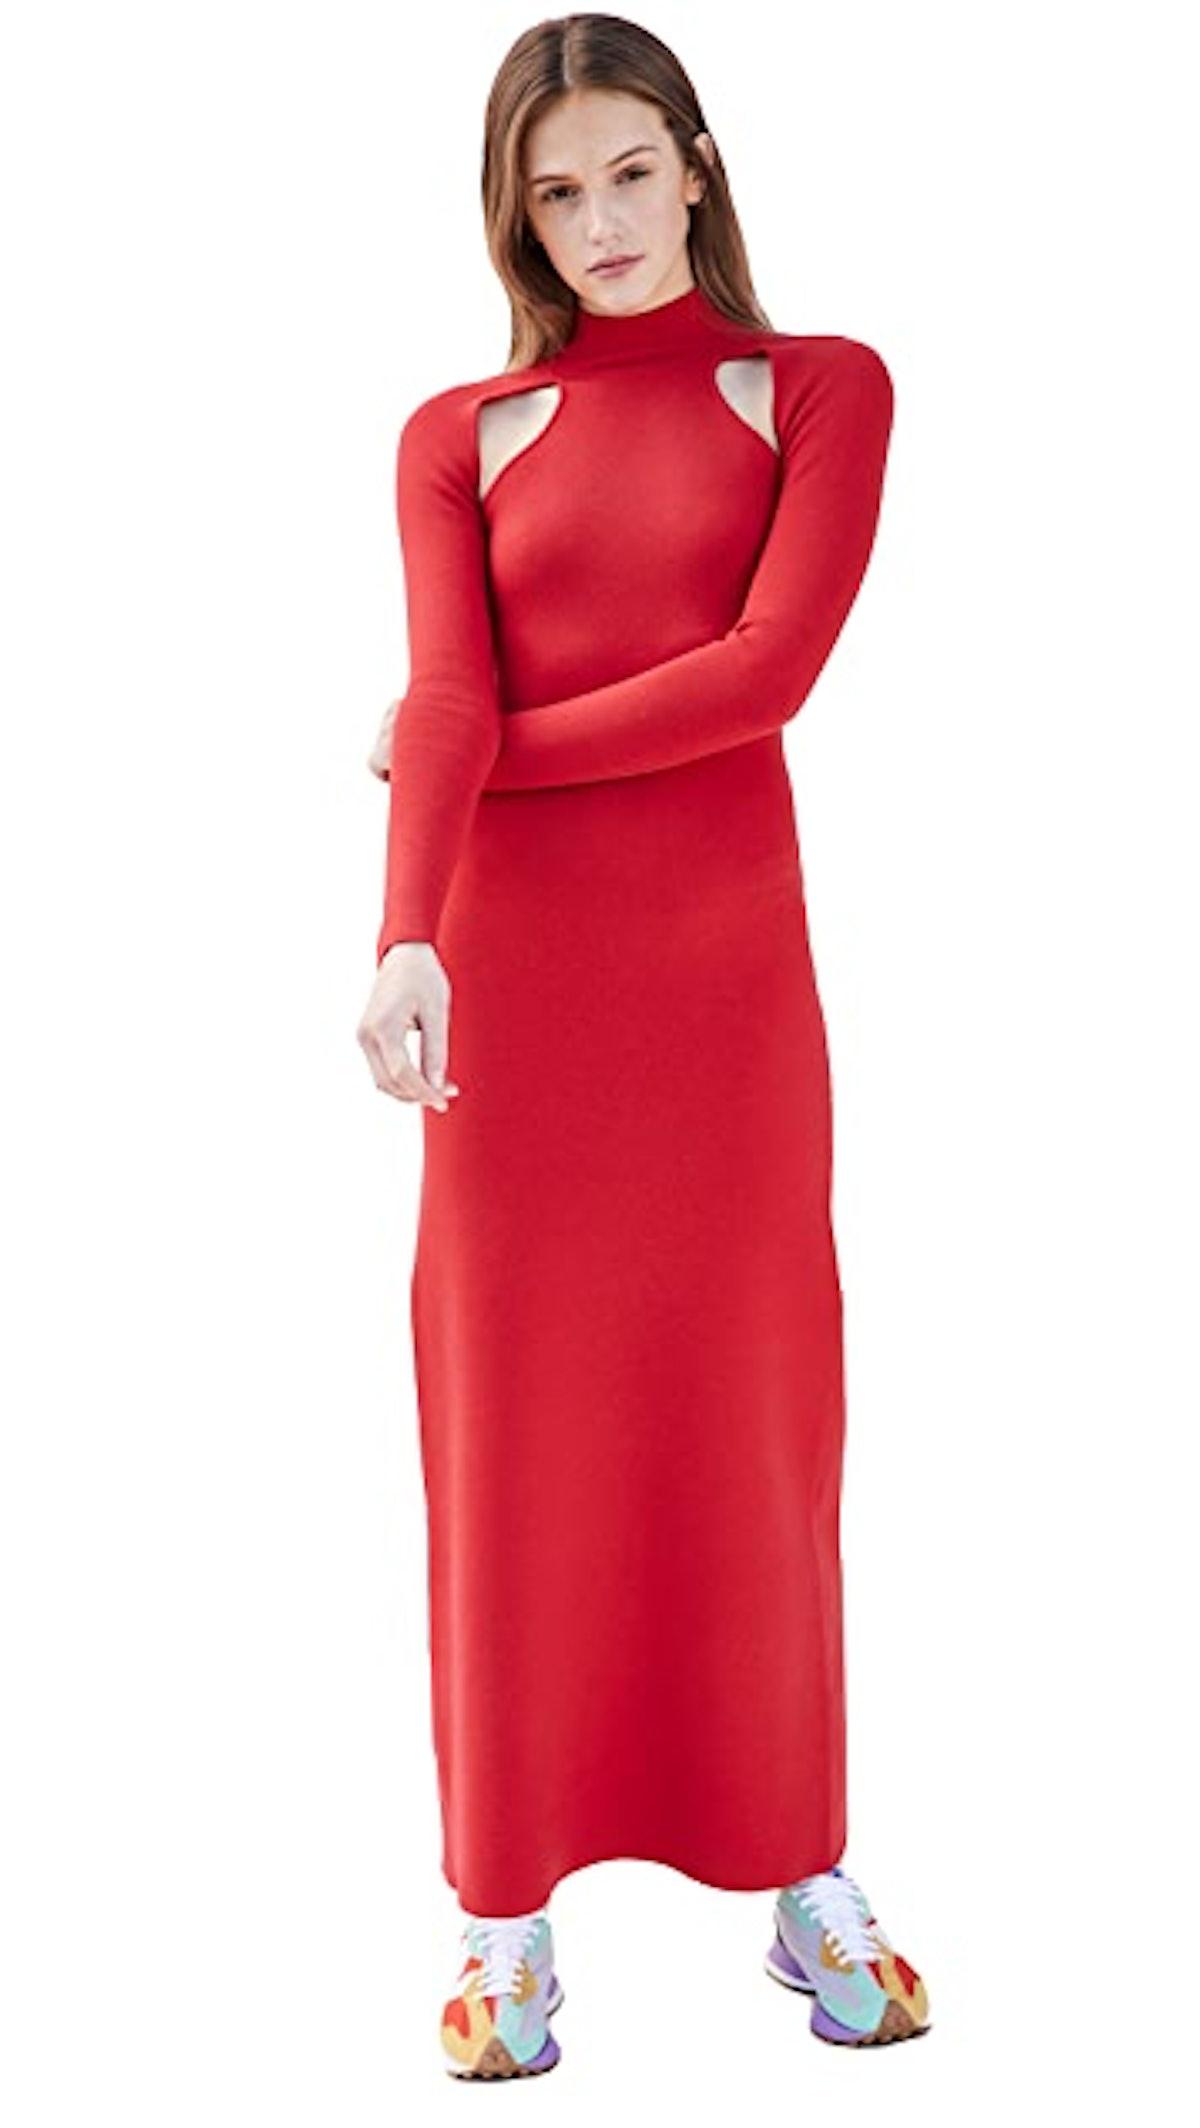 T Neck Dress